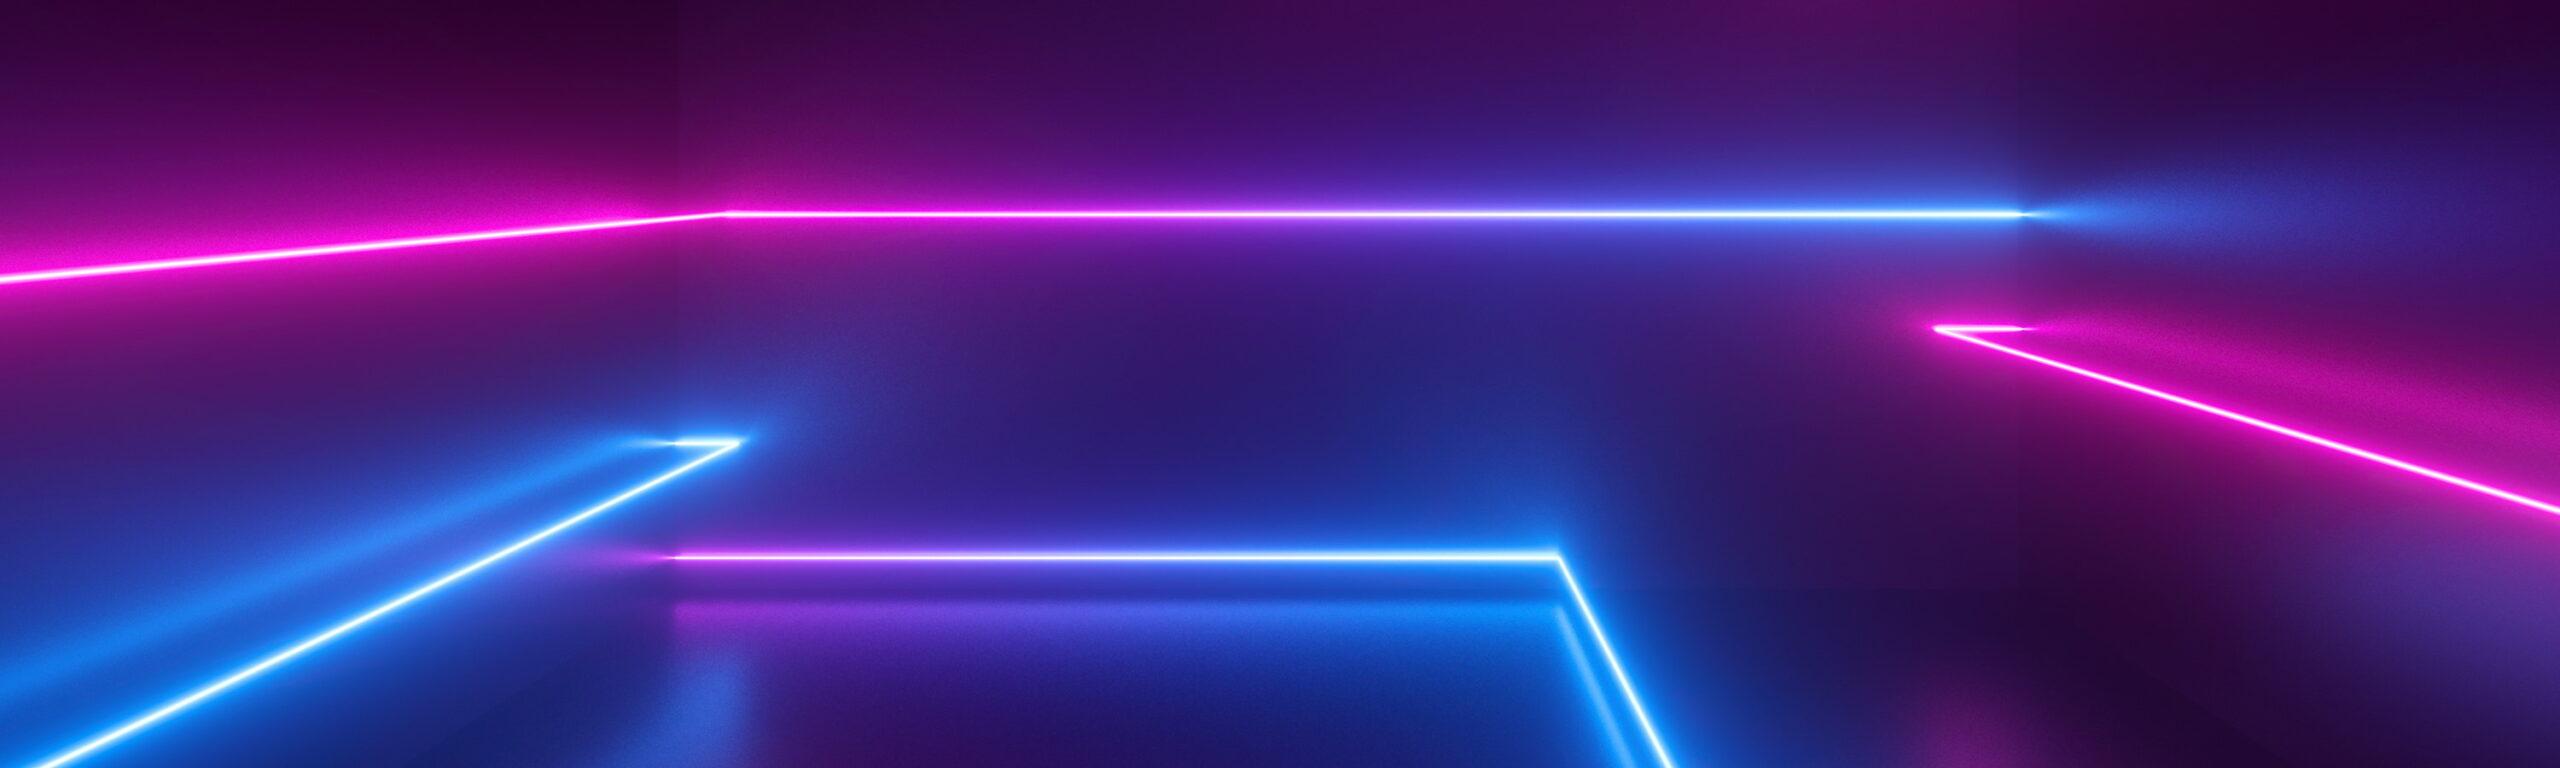 neon-nagel_header_kontakt